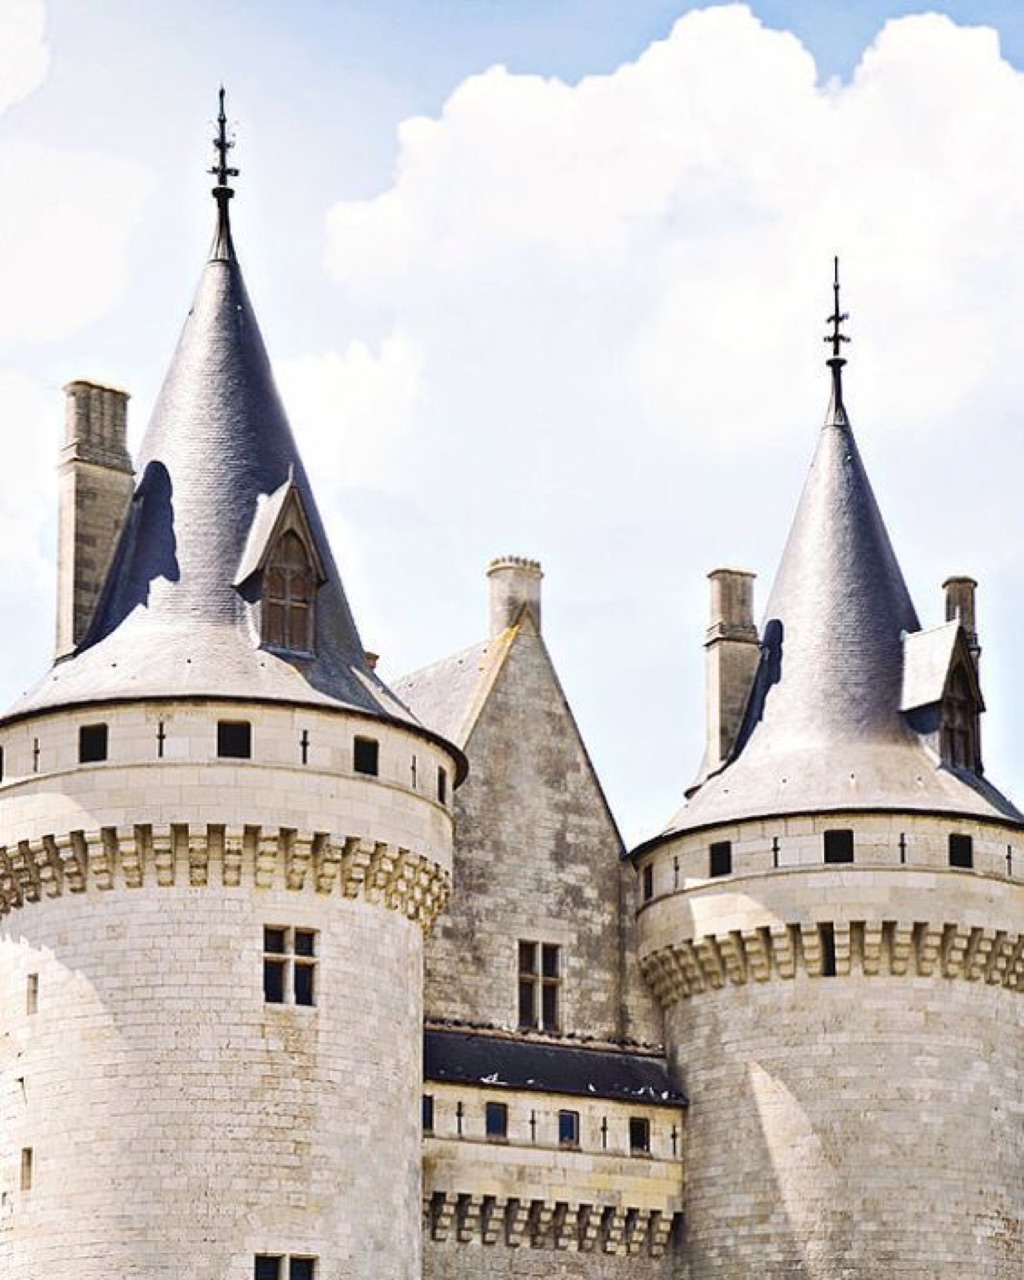 castle and landscape image